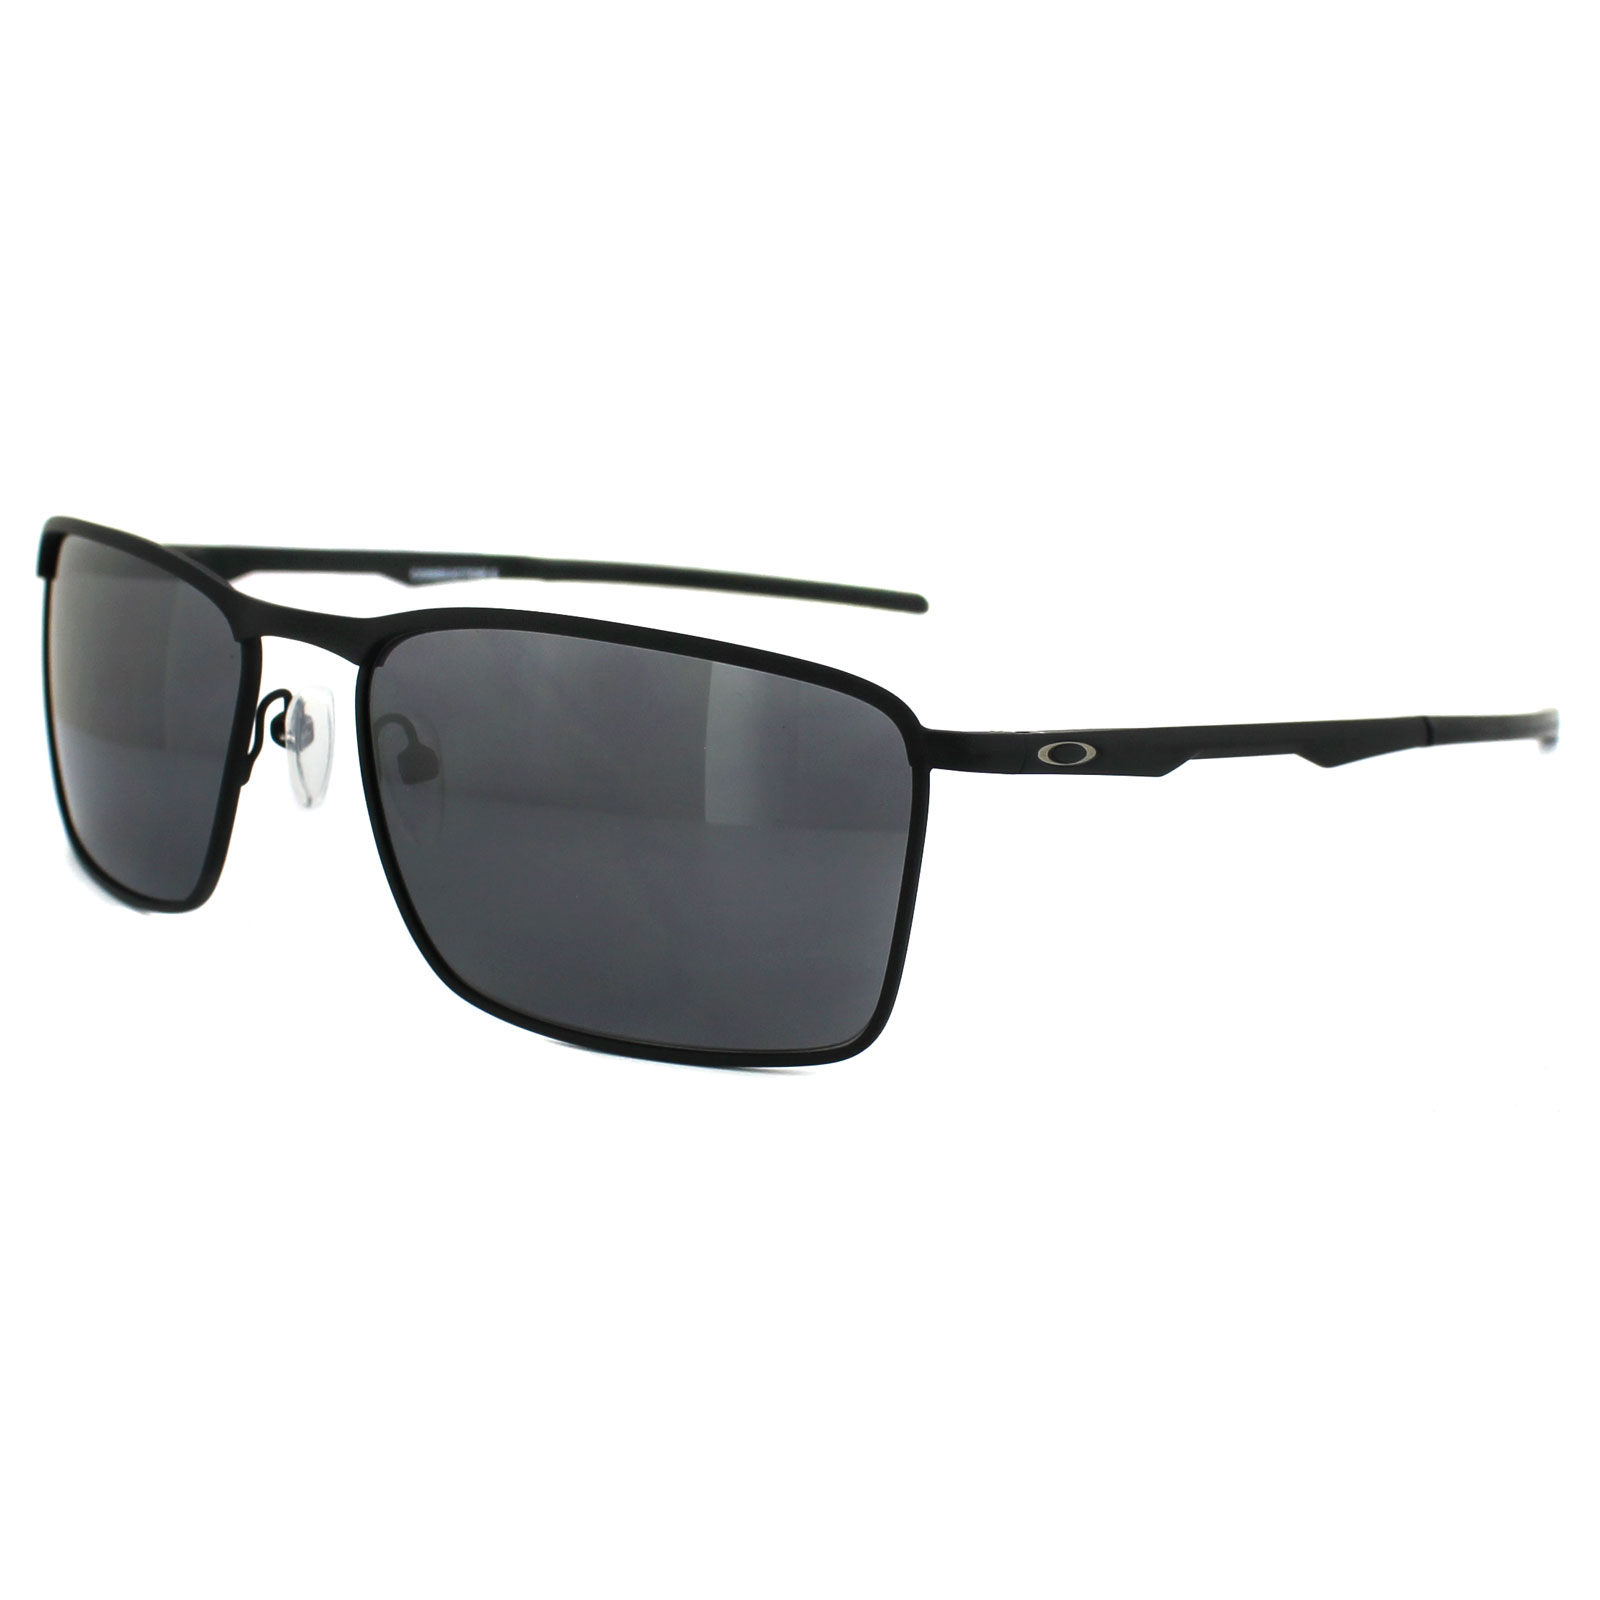 a7957404494 Cheap Oakley Conductor 6 Sunglasses - Discounted Sunglasses